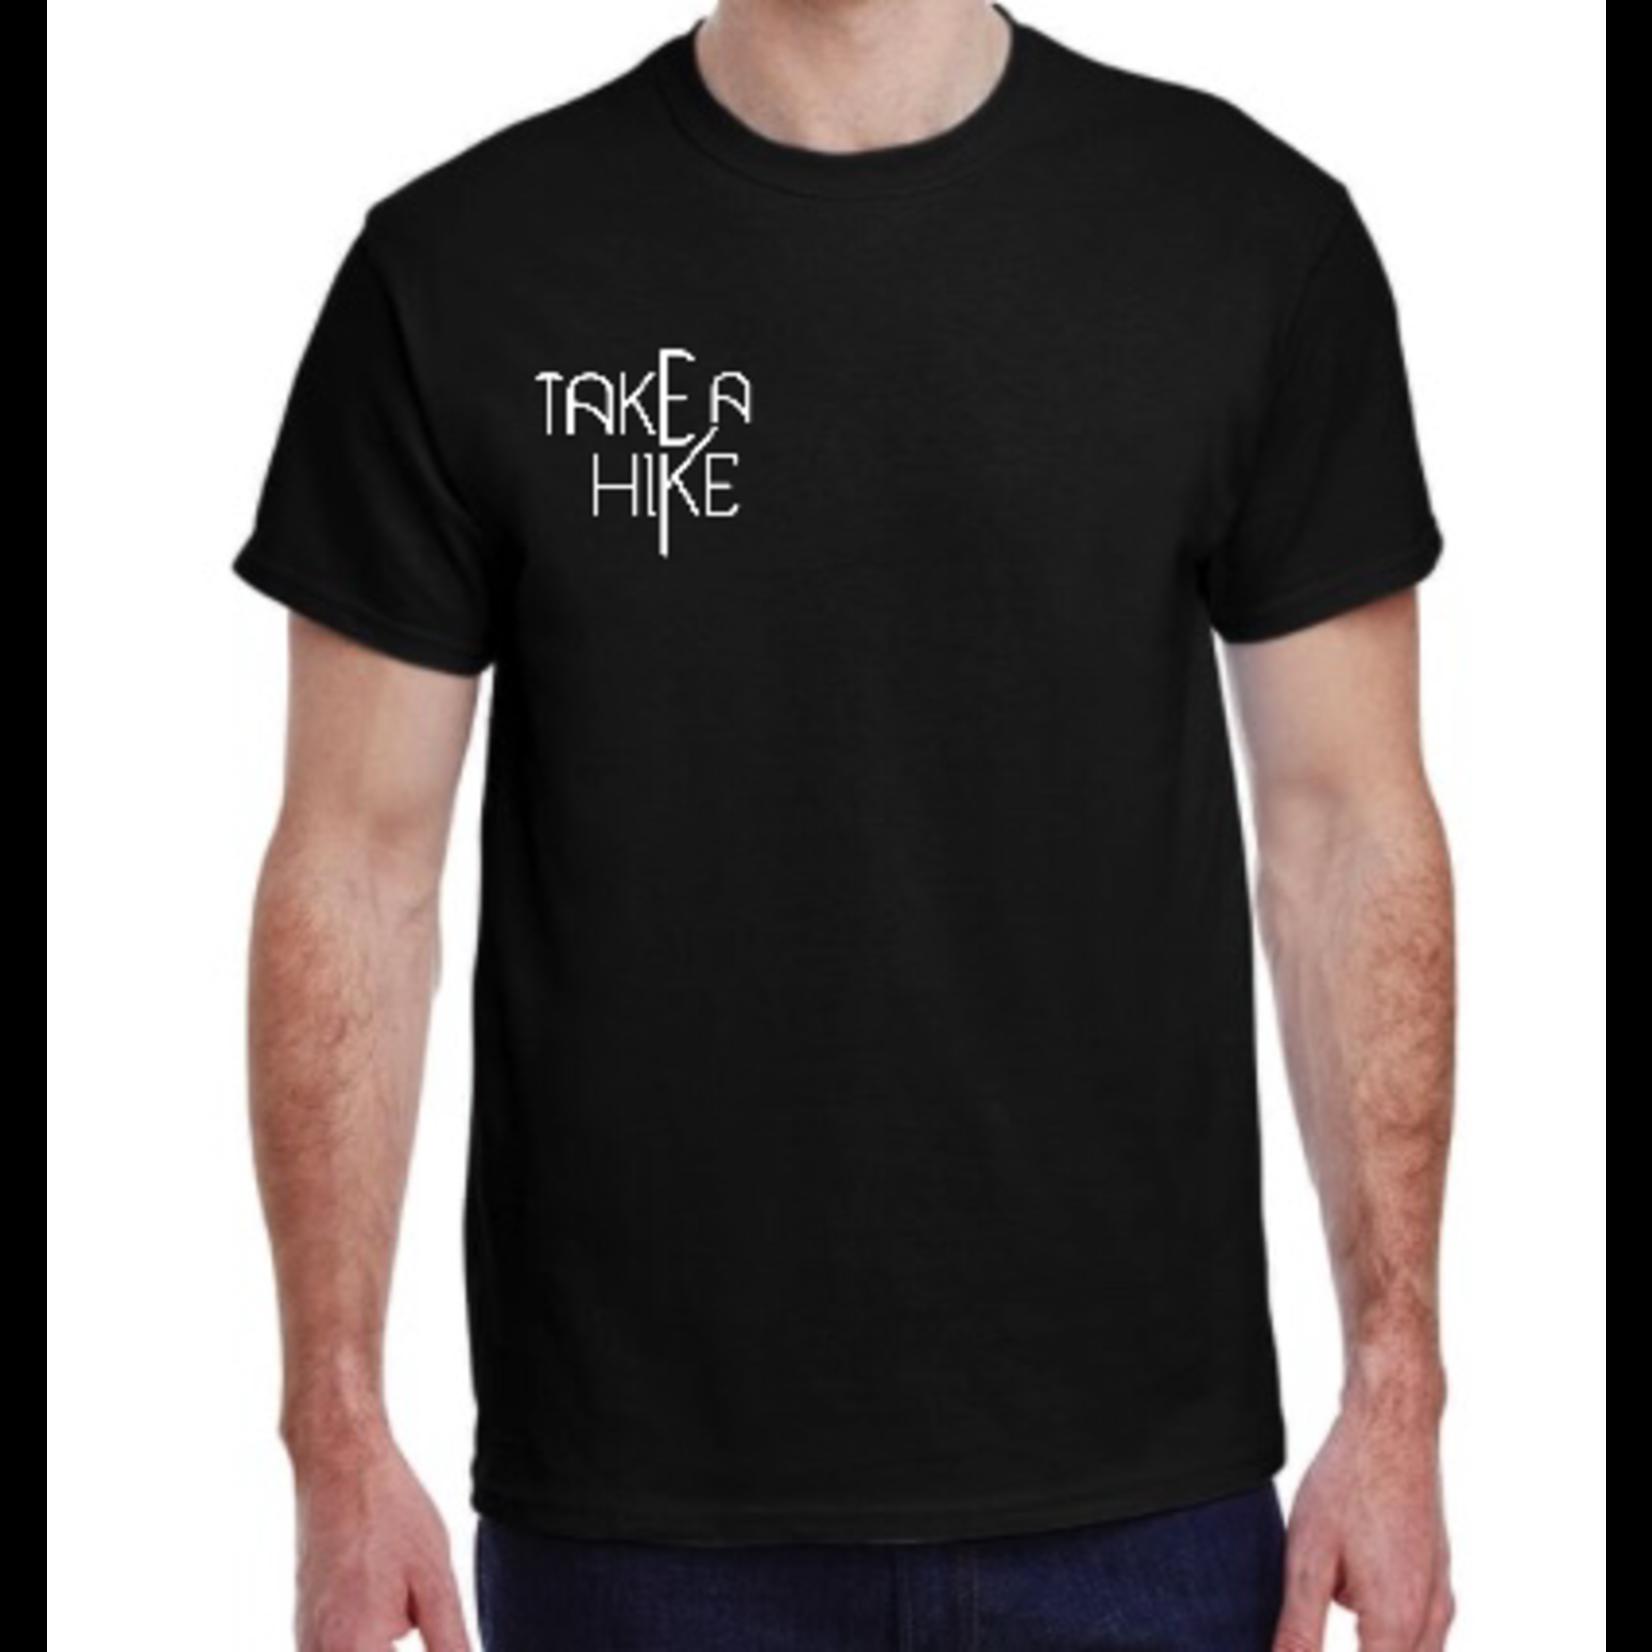 favourite things apparel Mens T-shirt: Take a hike